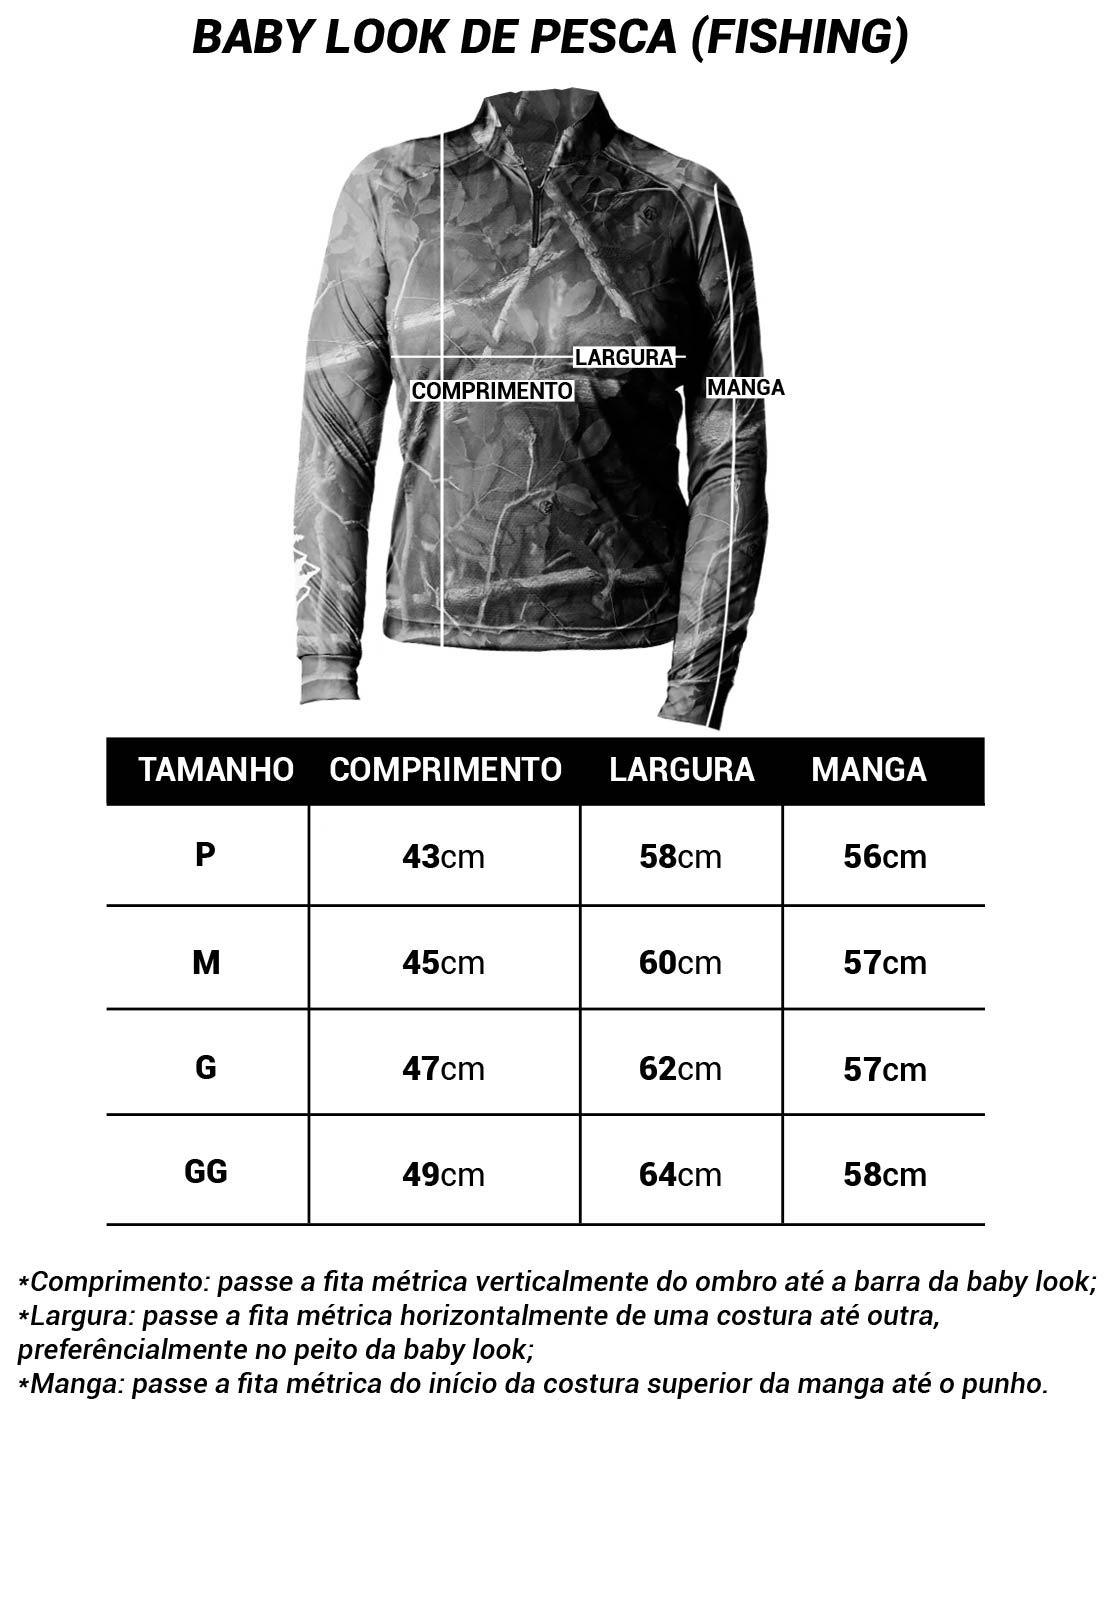 CAMISA DE PESCA FISH TECH PRO 11 FEMININA + BANDANA GRÁTIS  - REAL HUNTER OUTDOORS